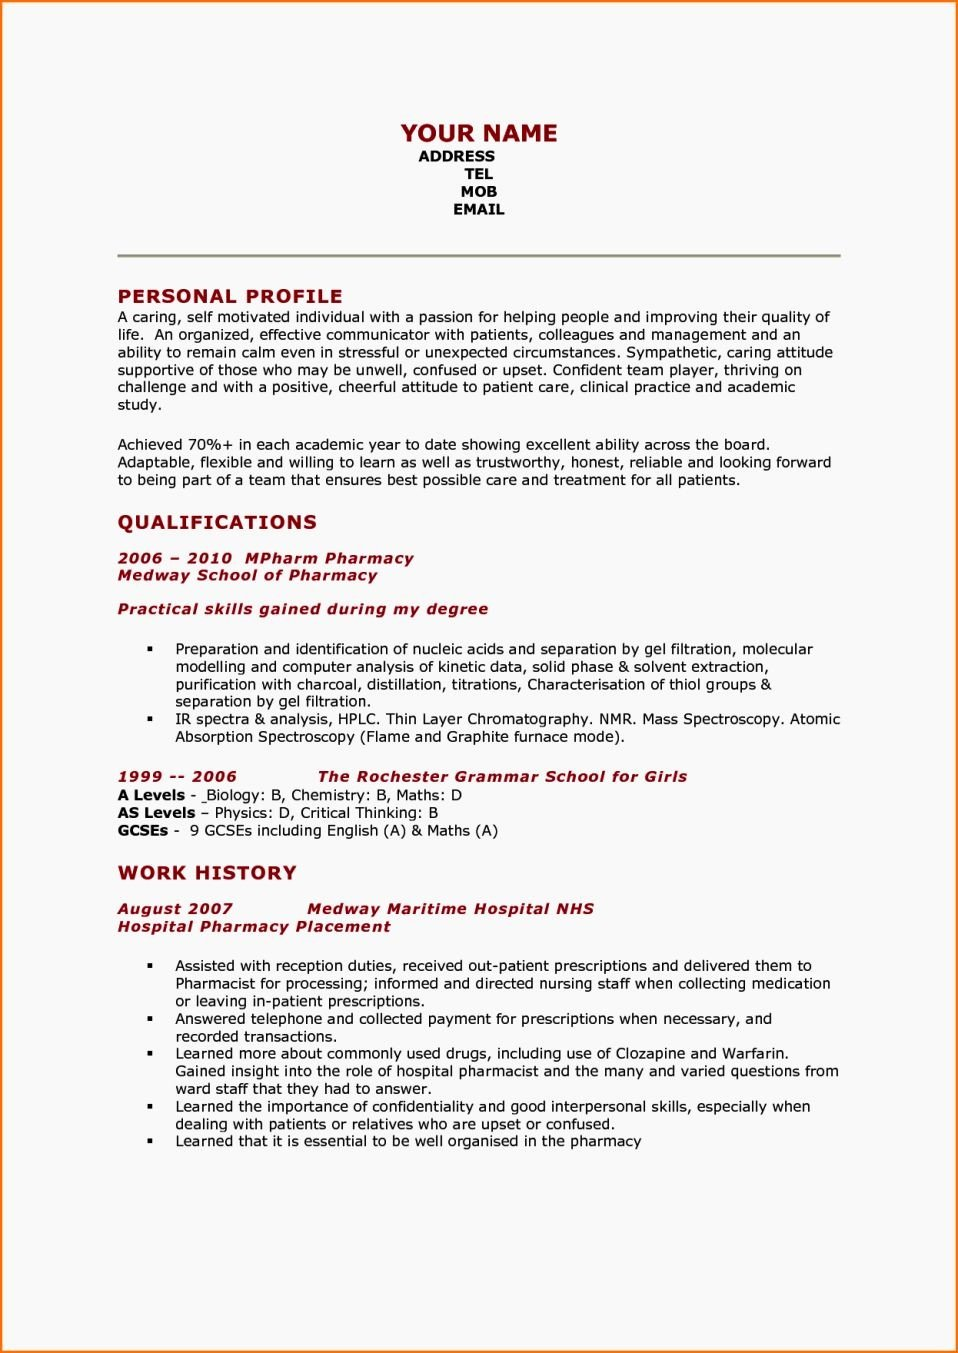 Best Resume format Pharmacist Plks